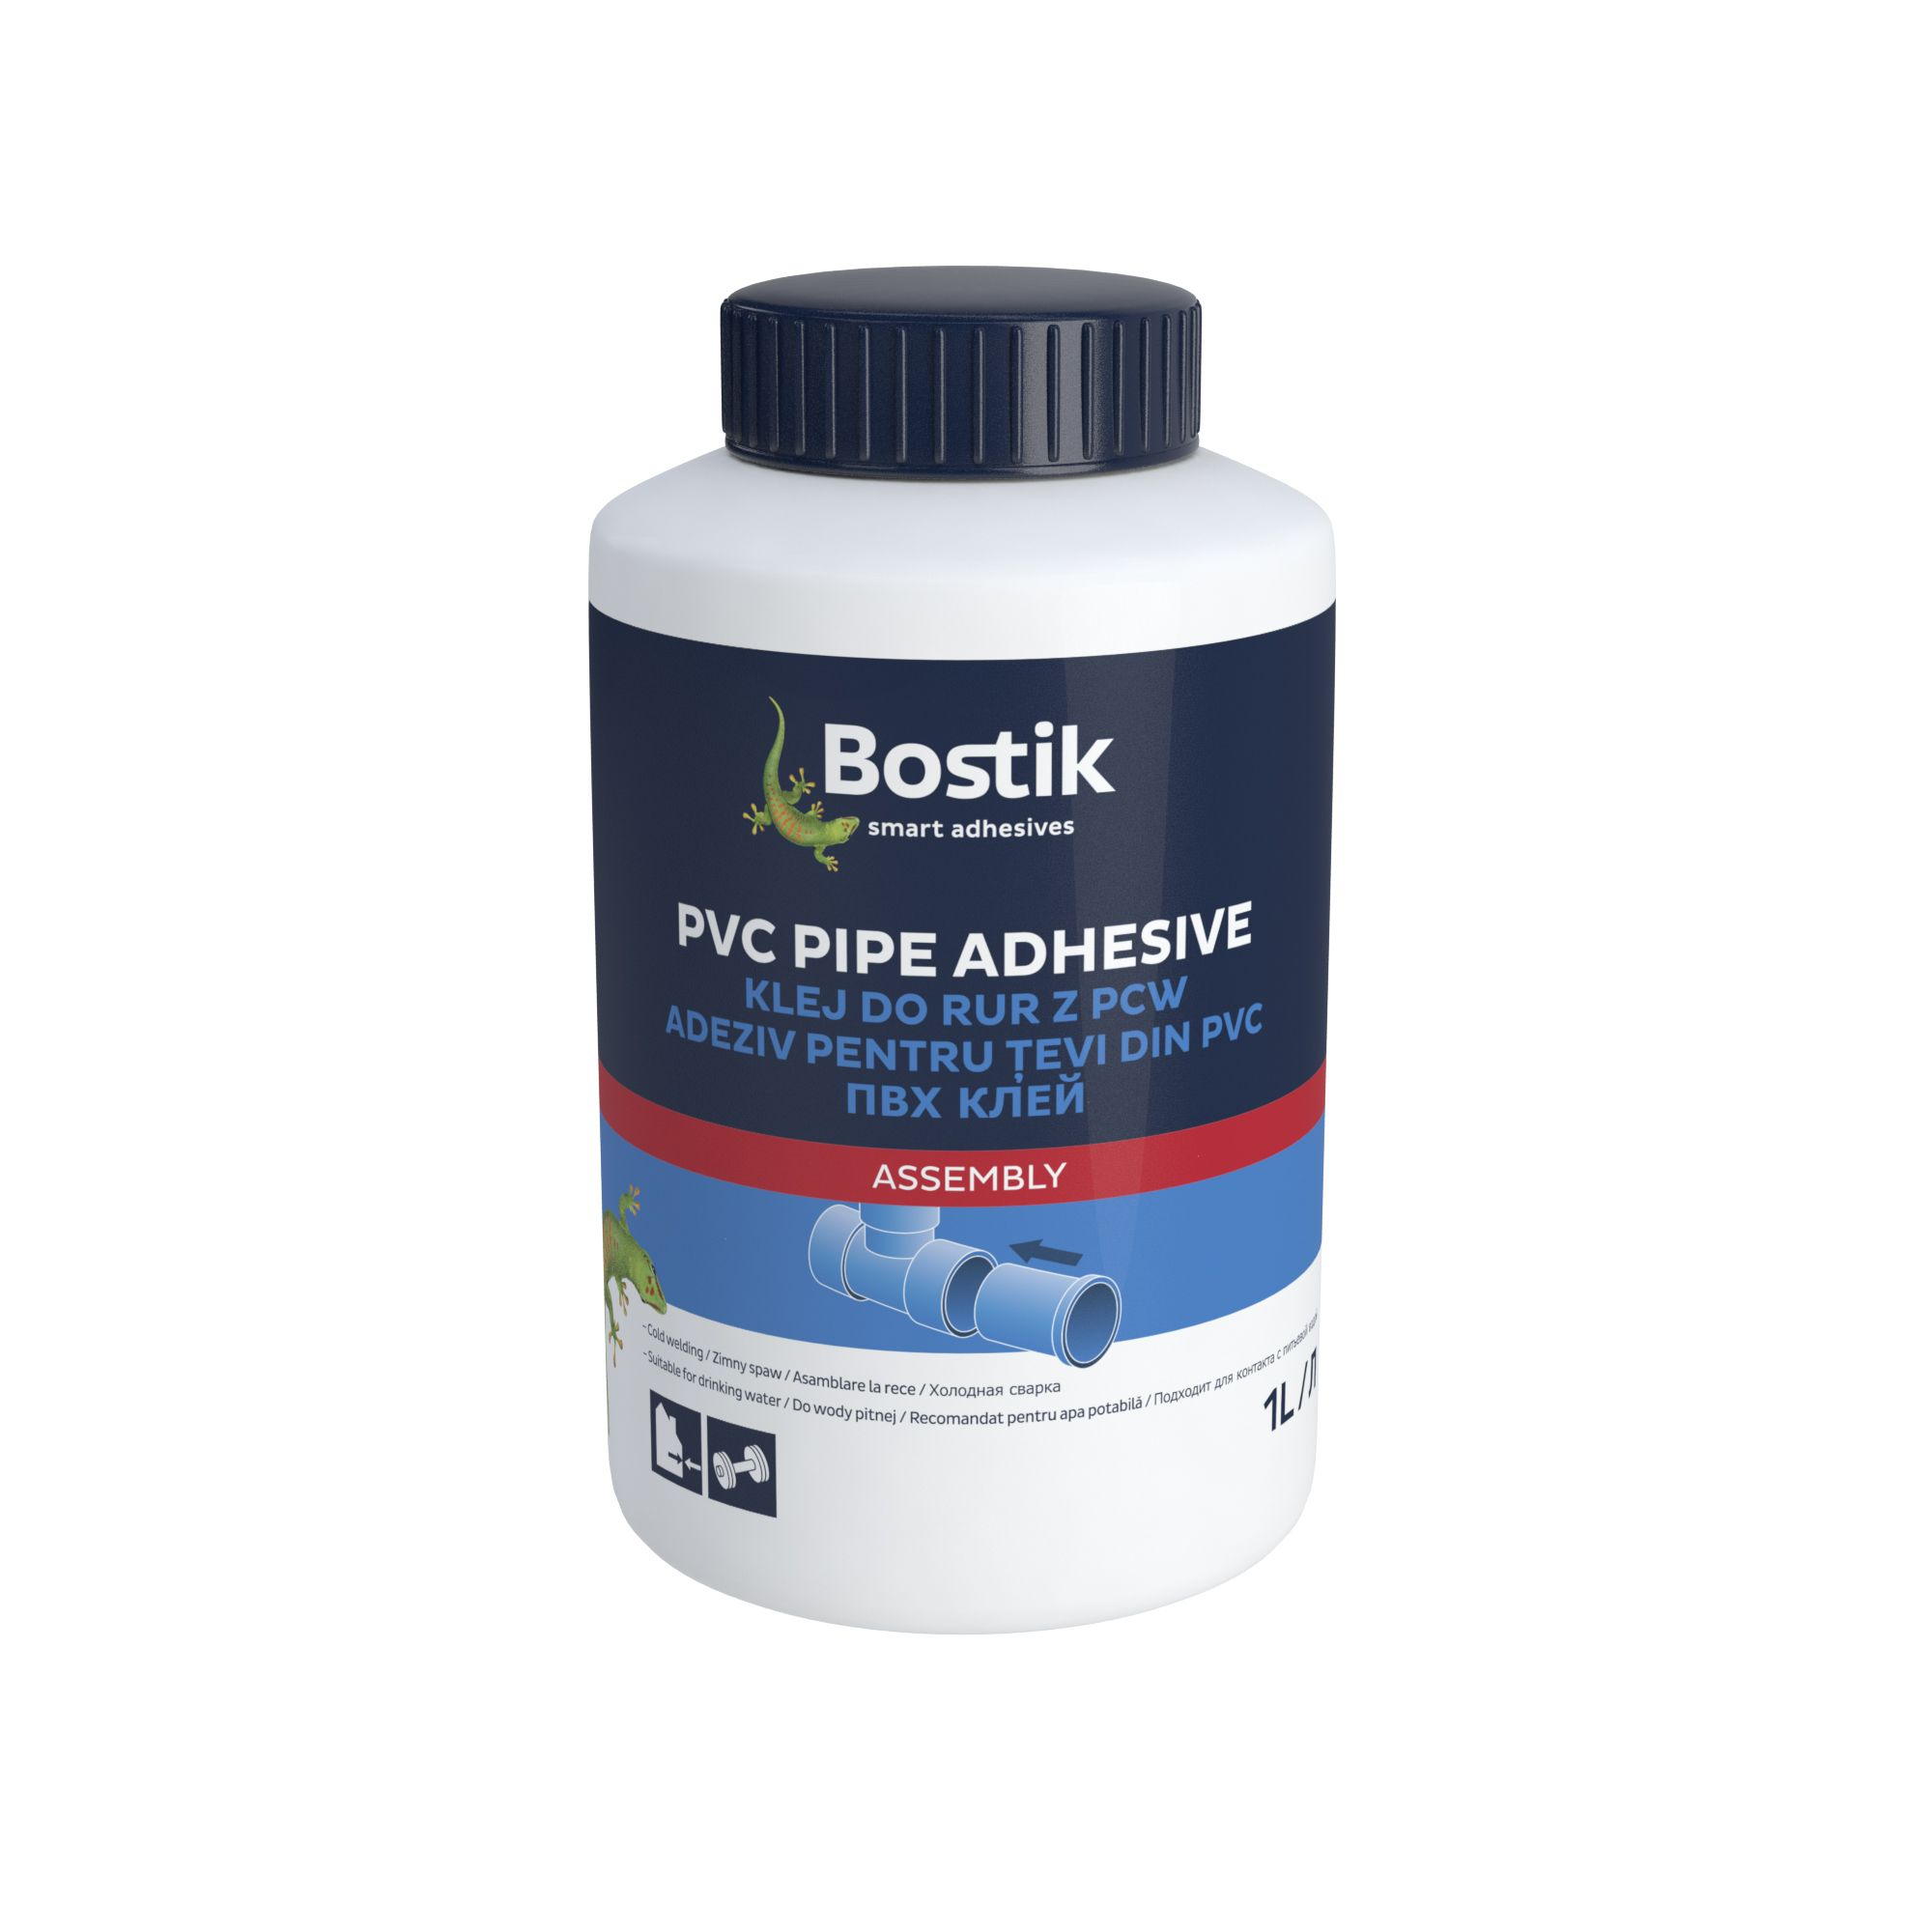 Bostik PVC glue PVC glue | Departments | DIY at B&Q